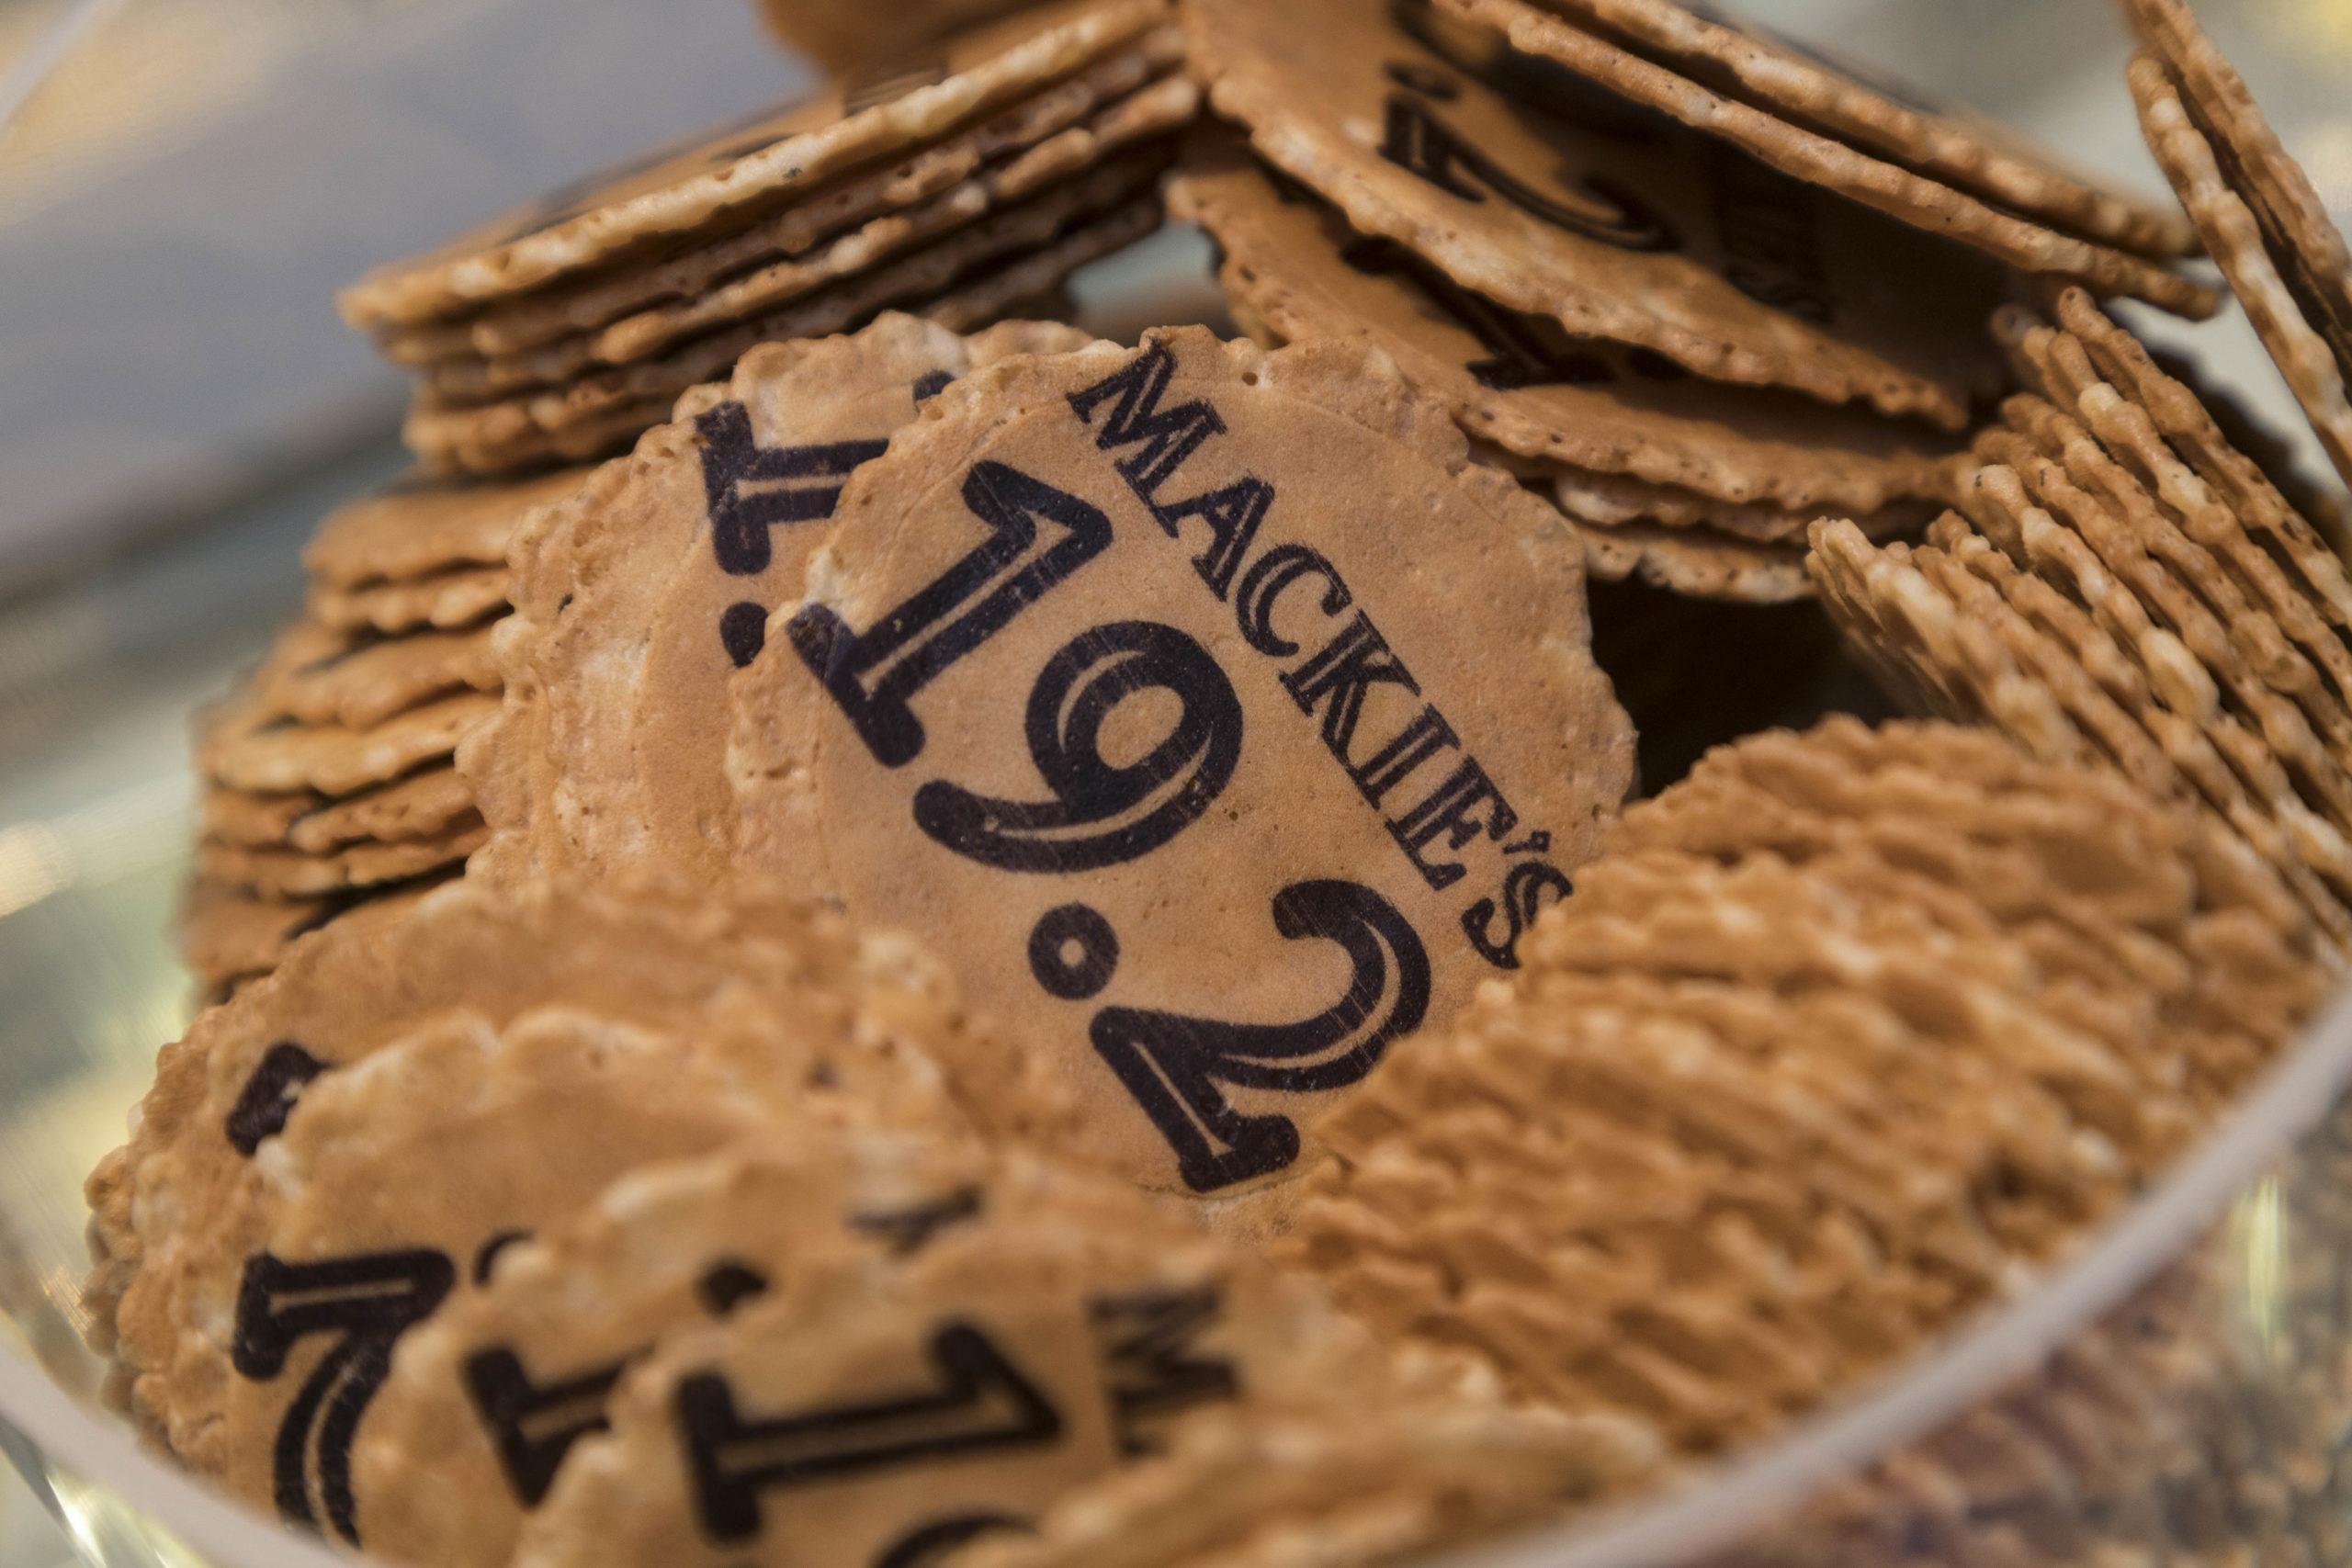 Mackies 19.2 will re-open on July 1